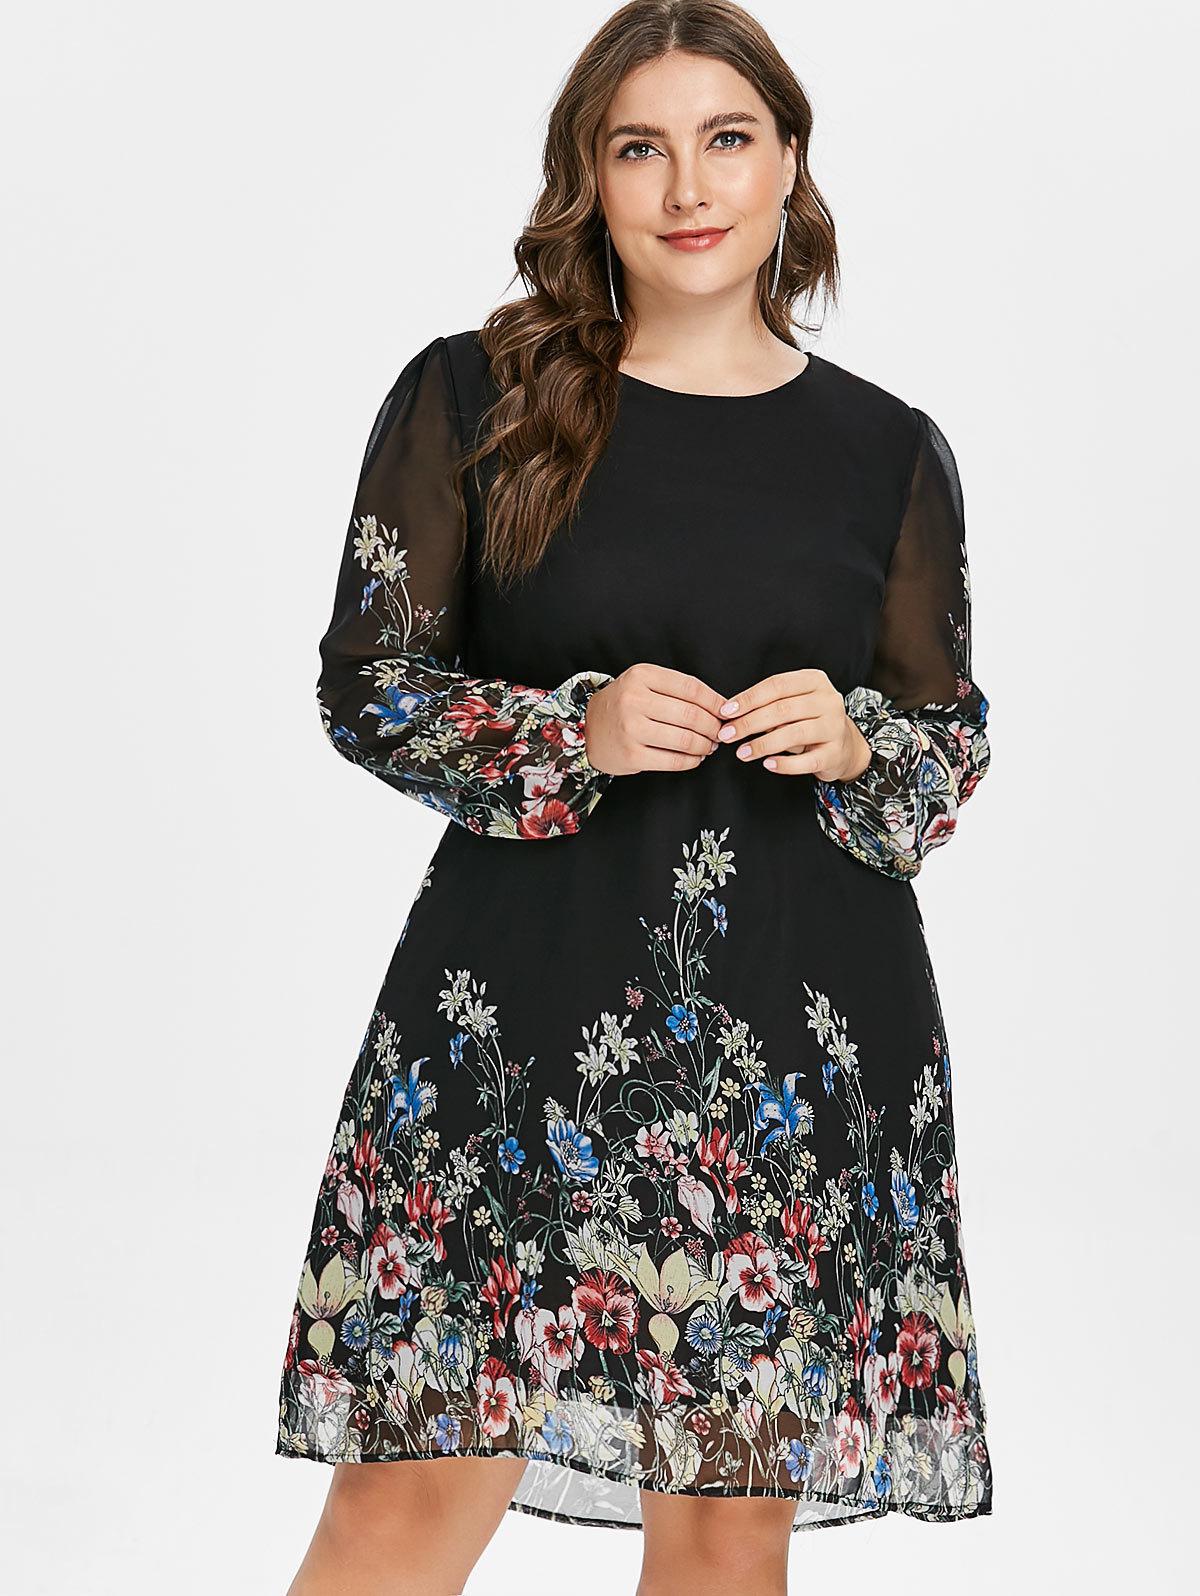 2019 Wipalo Plus Size Floral Print Tunic Women Dress Long Sleeve Autumn  Elegant Tribal Flower Print Vocation Shirt Dress Chiffon 5XL T190608 From  ...